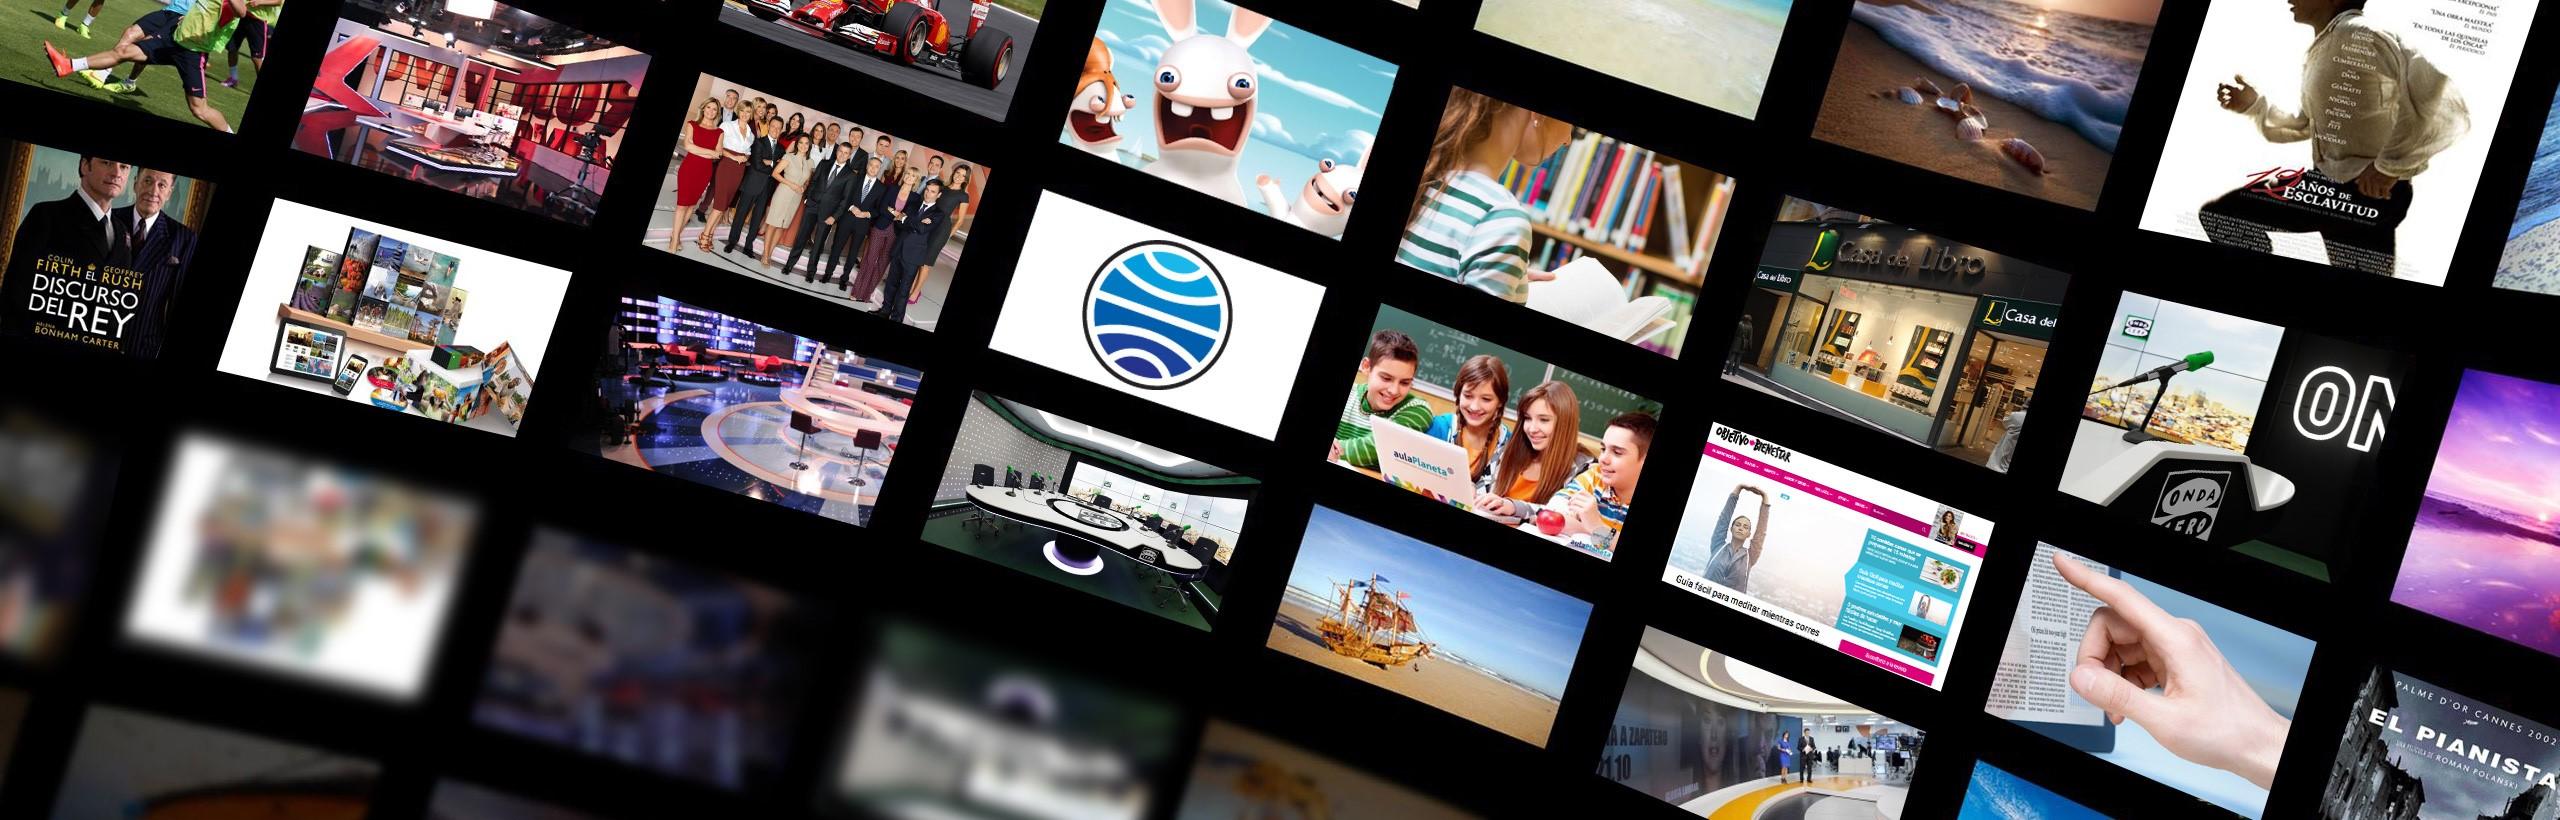 Creem i distribuïm contingutsculturals, informatius, formatius i d'entreteniment audiovisual.